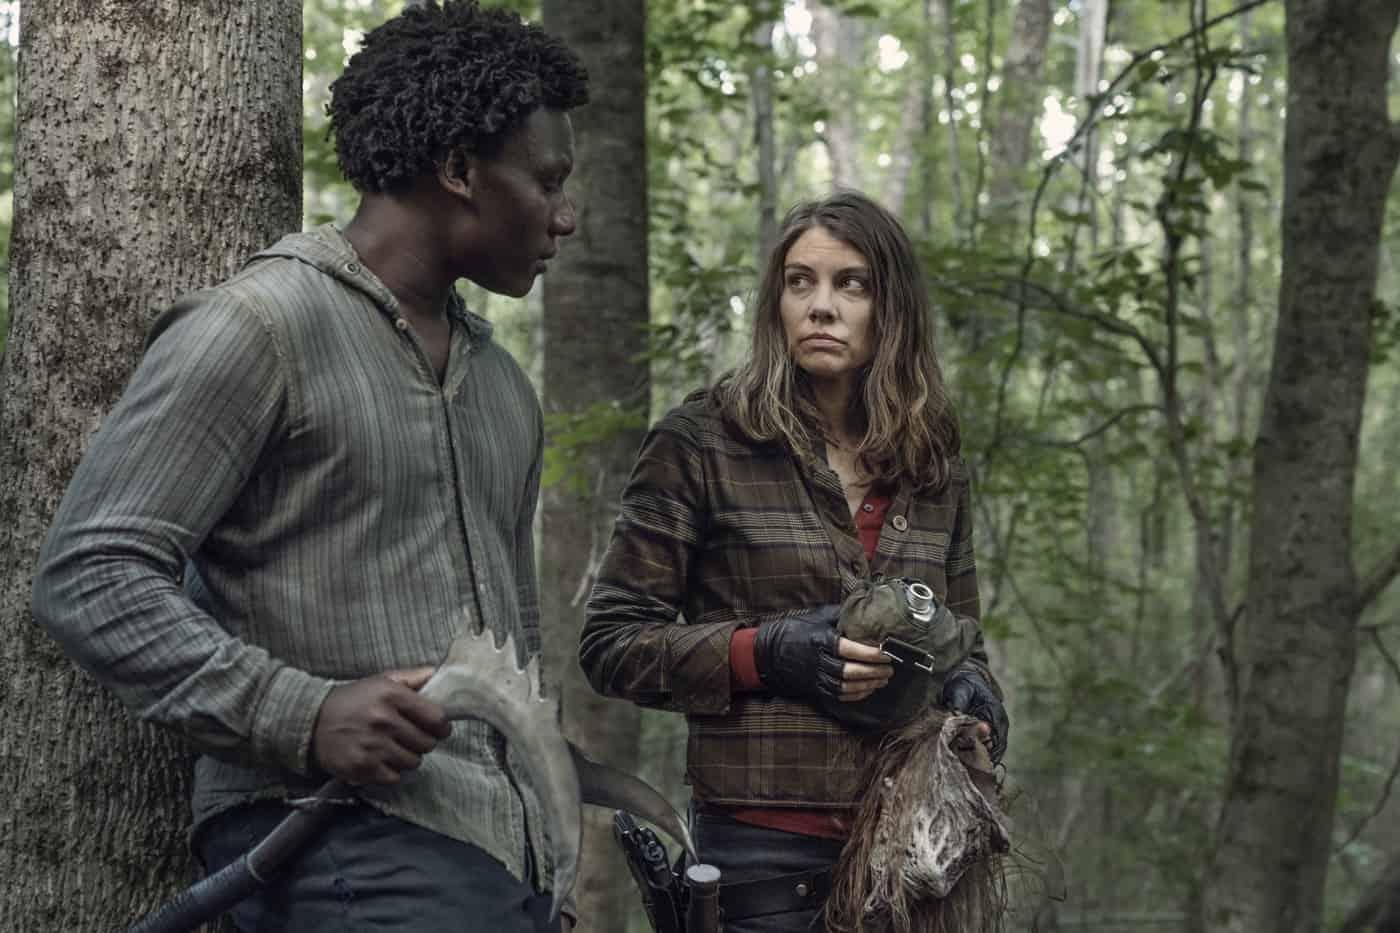 THE WALKING DEAD Season 11 Episode 7 Photos Promises Broken